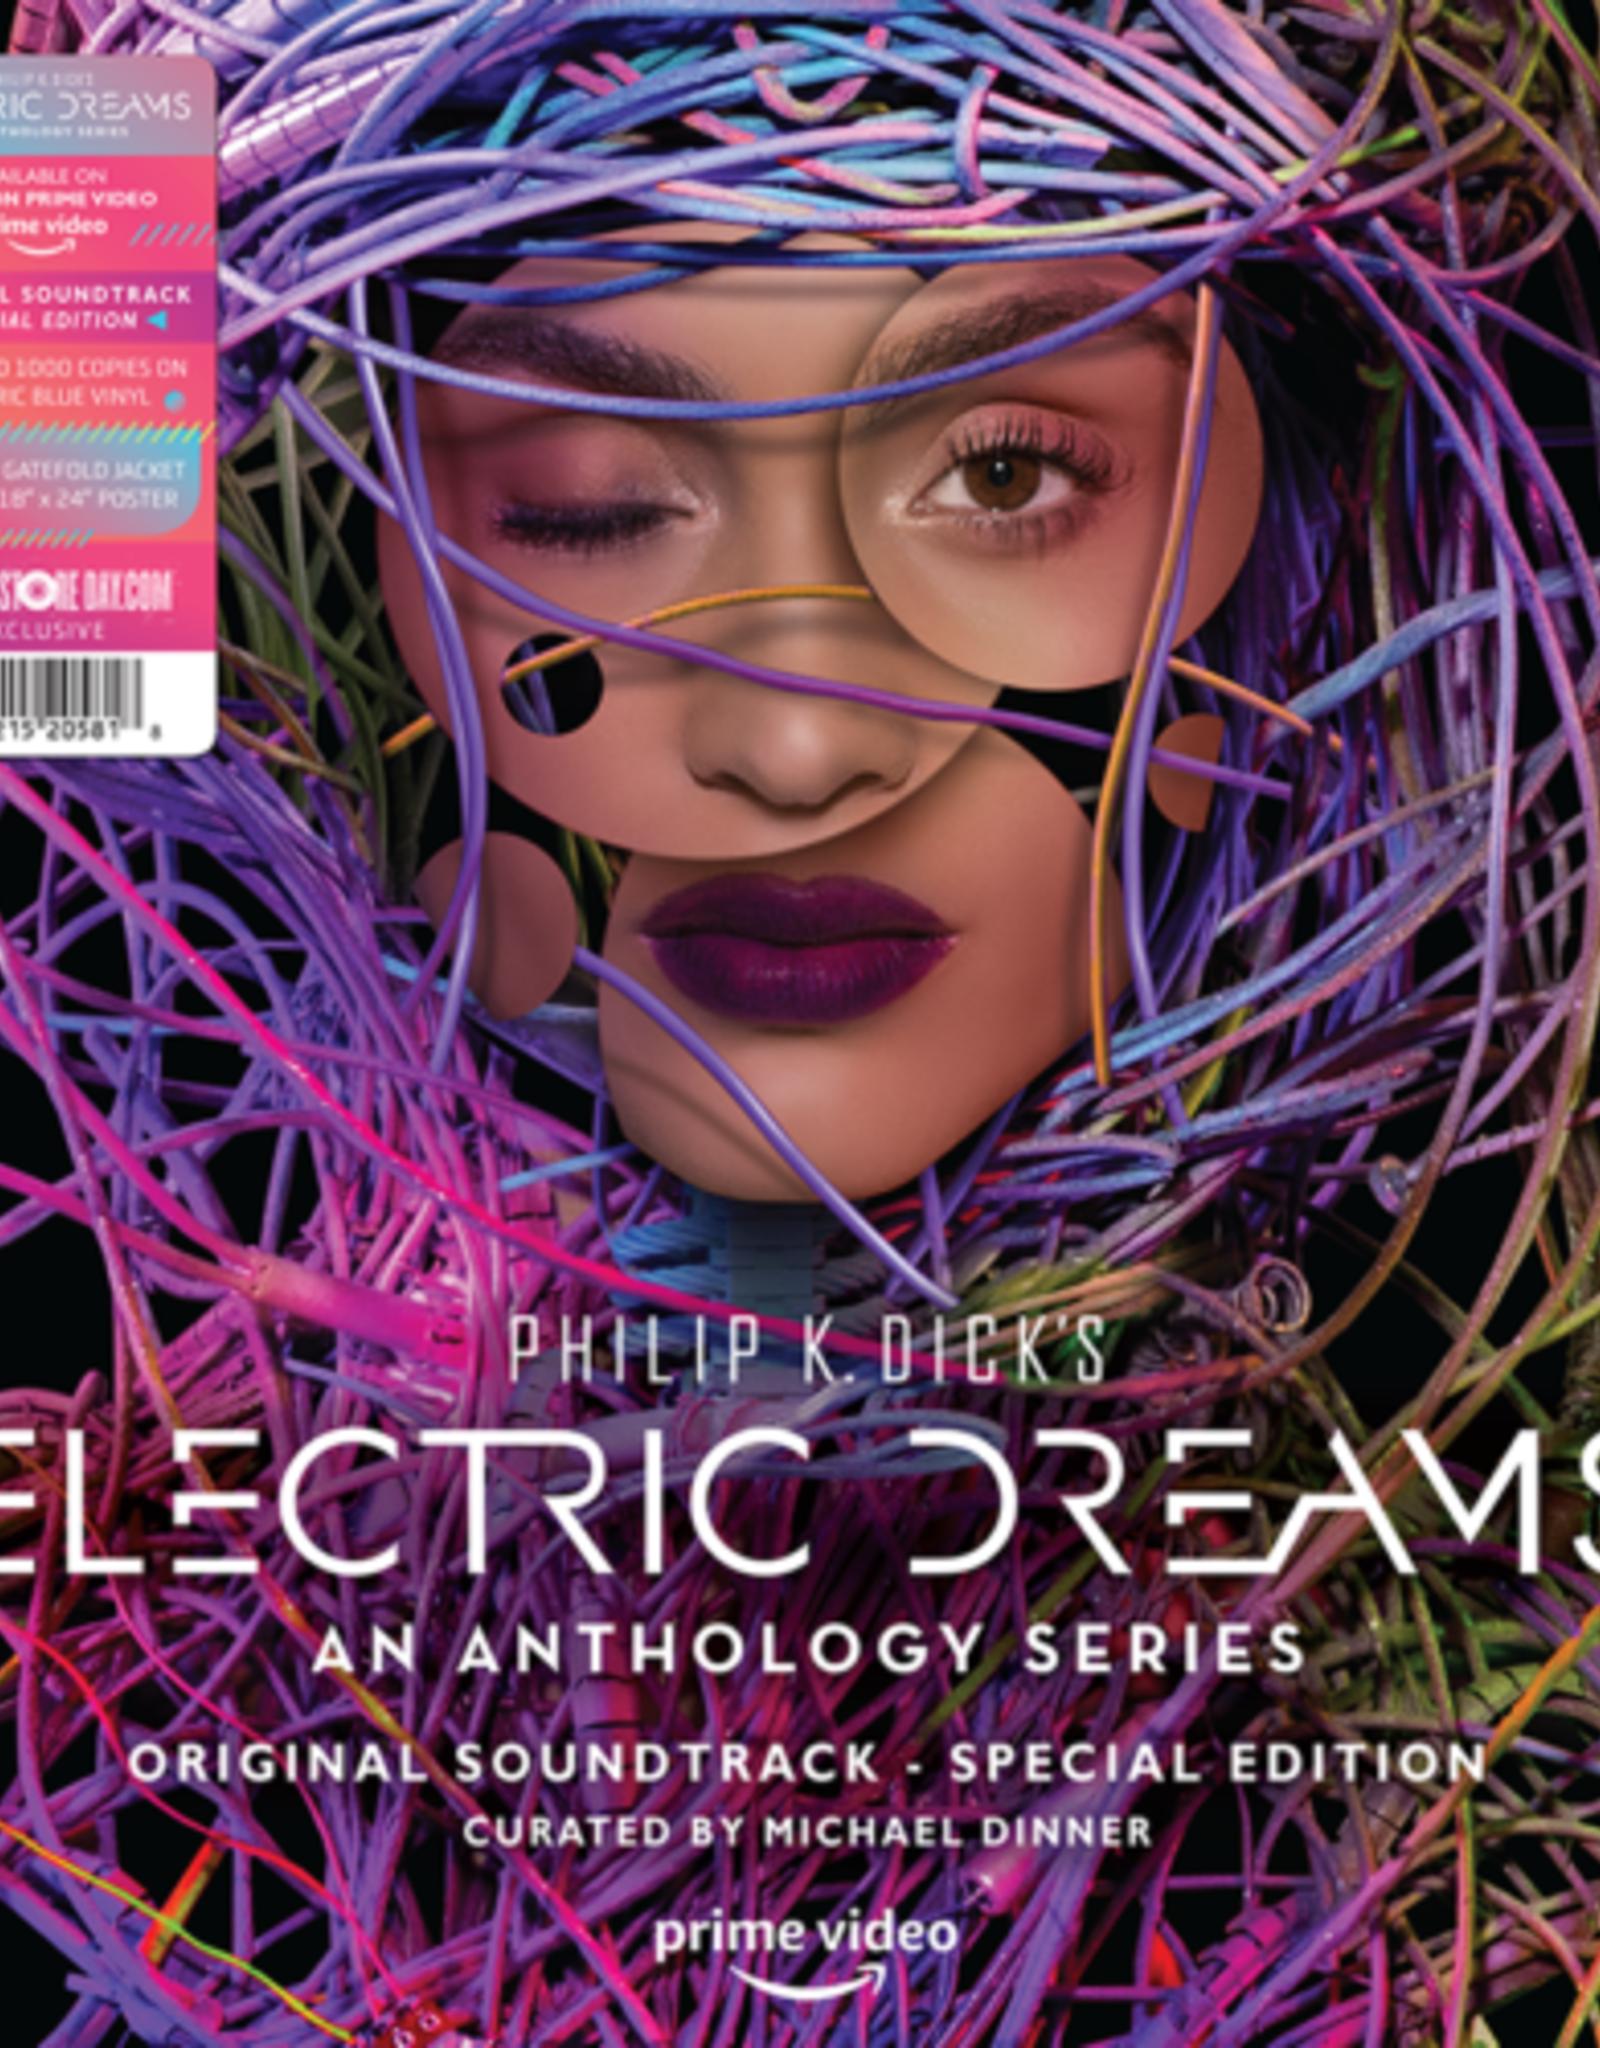 Various Artists - Philip K. Dick'S Electric Dreams Ost (Electric Blue Vinyl/Poster/Gatefold Jacket) (Rsd 2019)